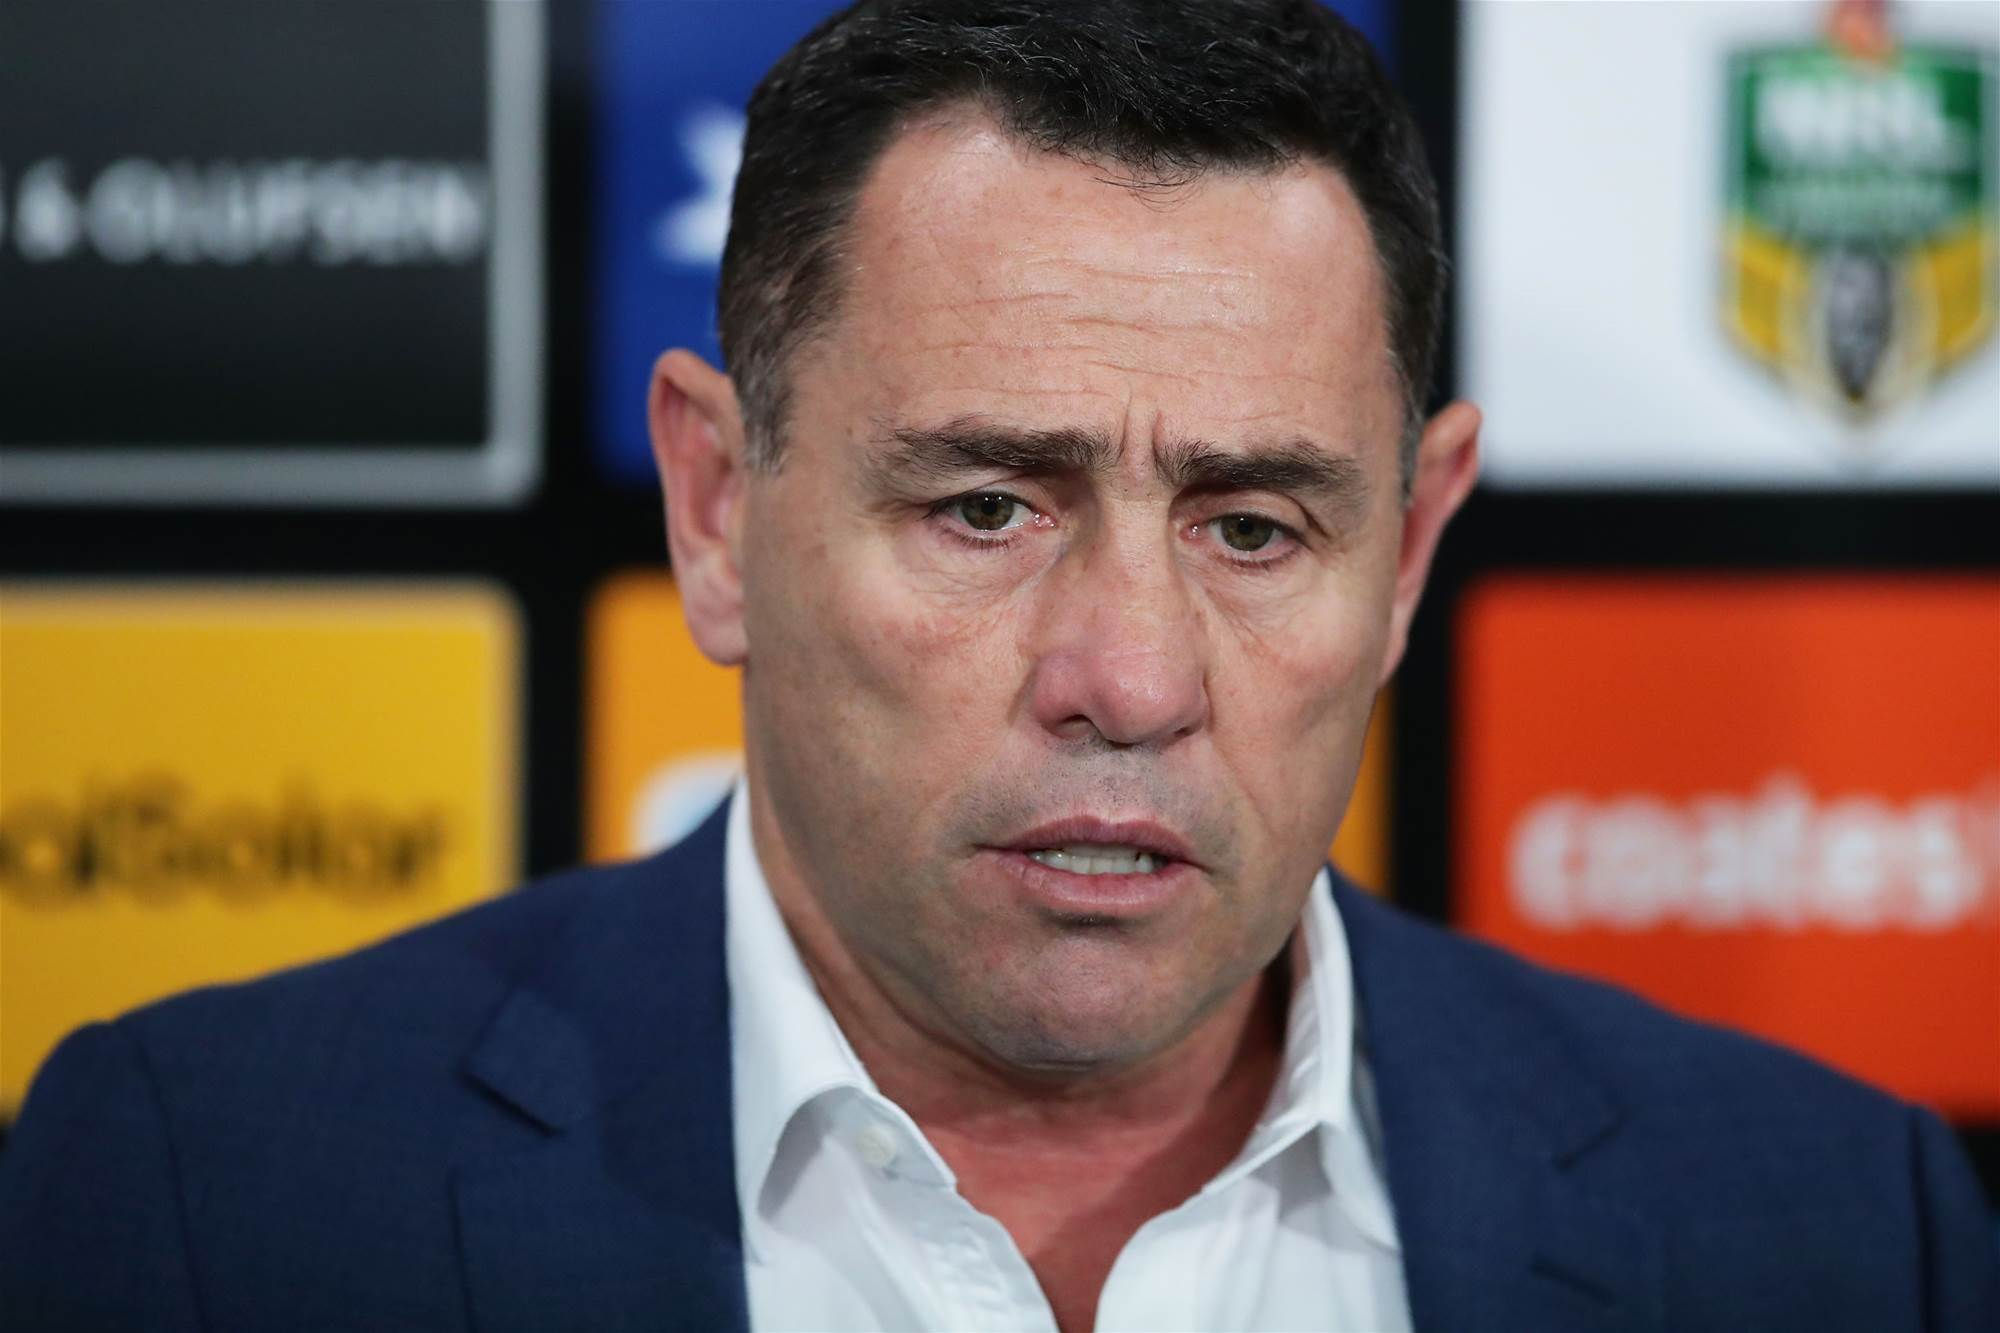 Sharks coach says sorry for $30,000 rant